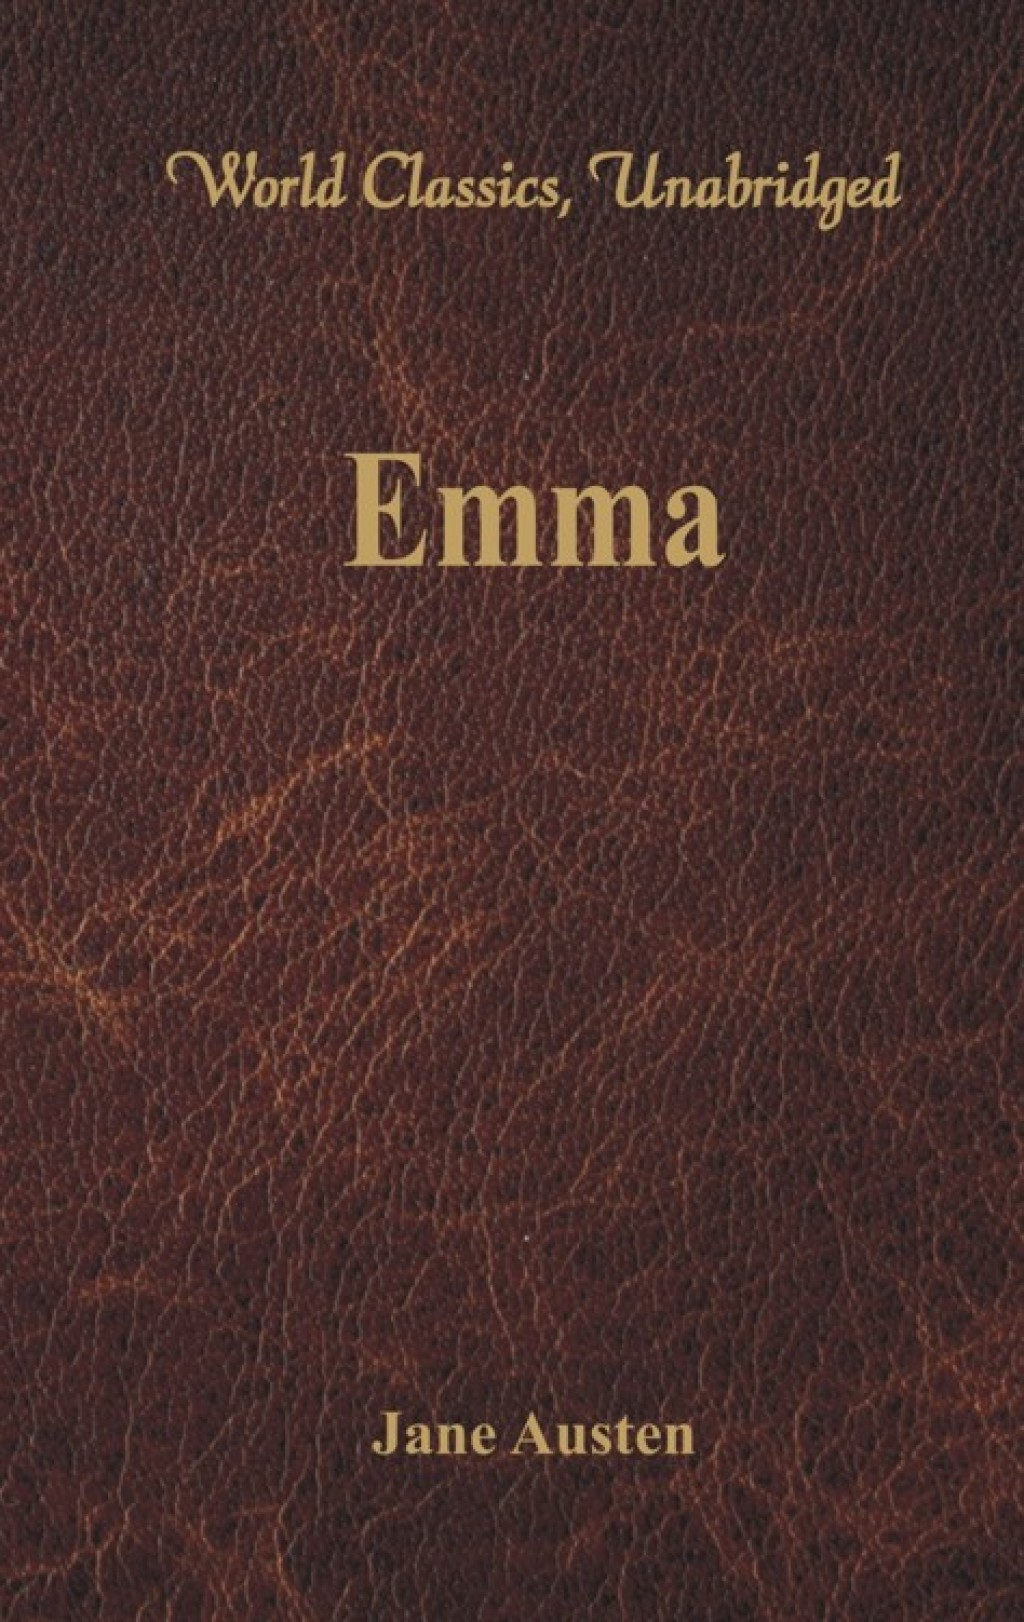 Emma (World Classics  Unabridged) (eBook) - Jane Austen